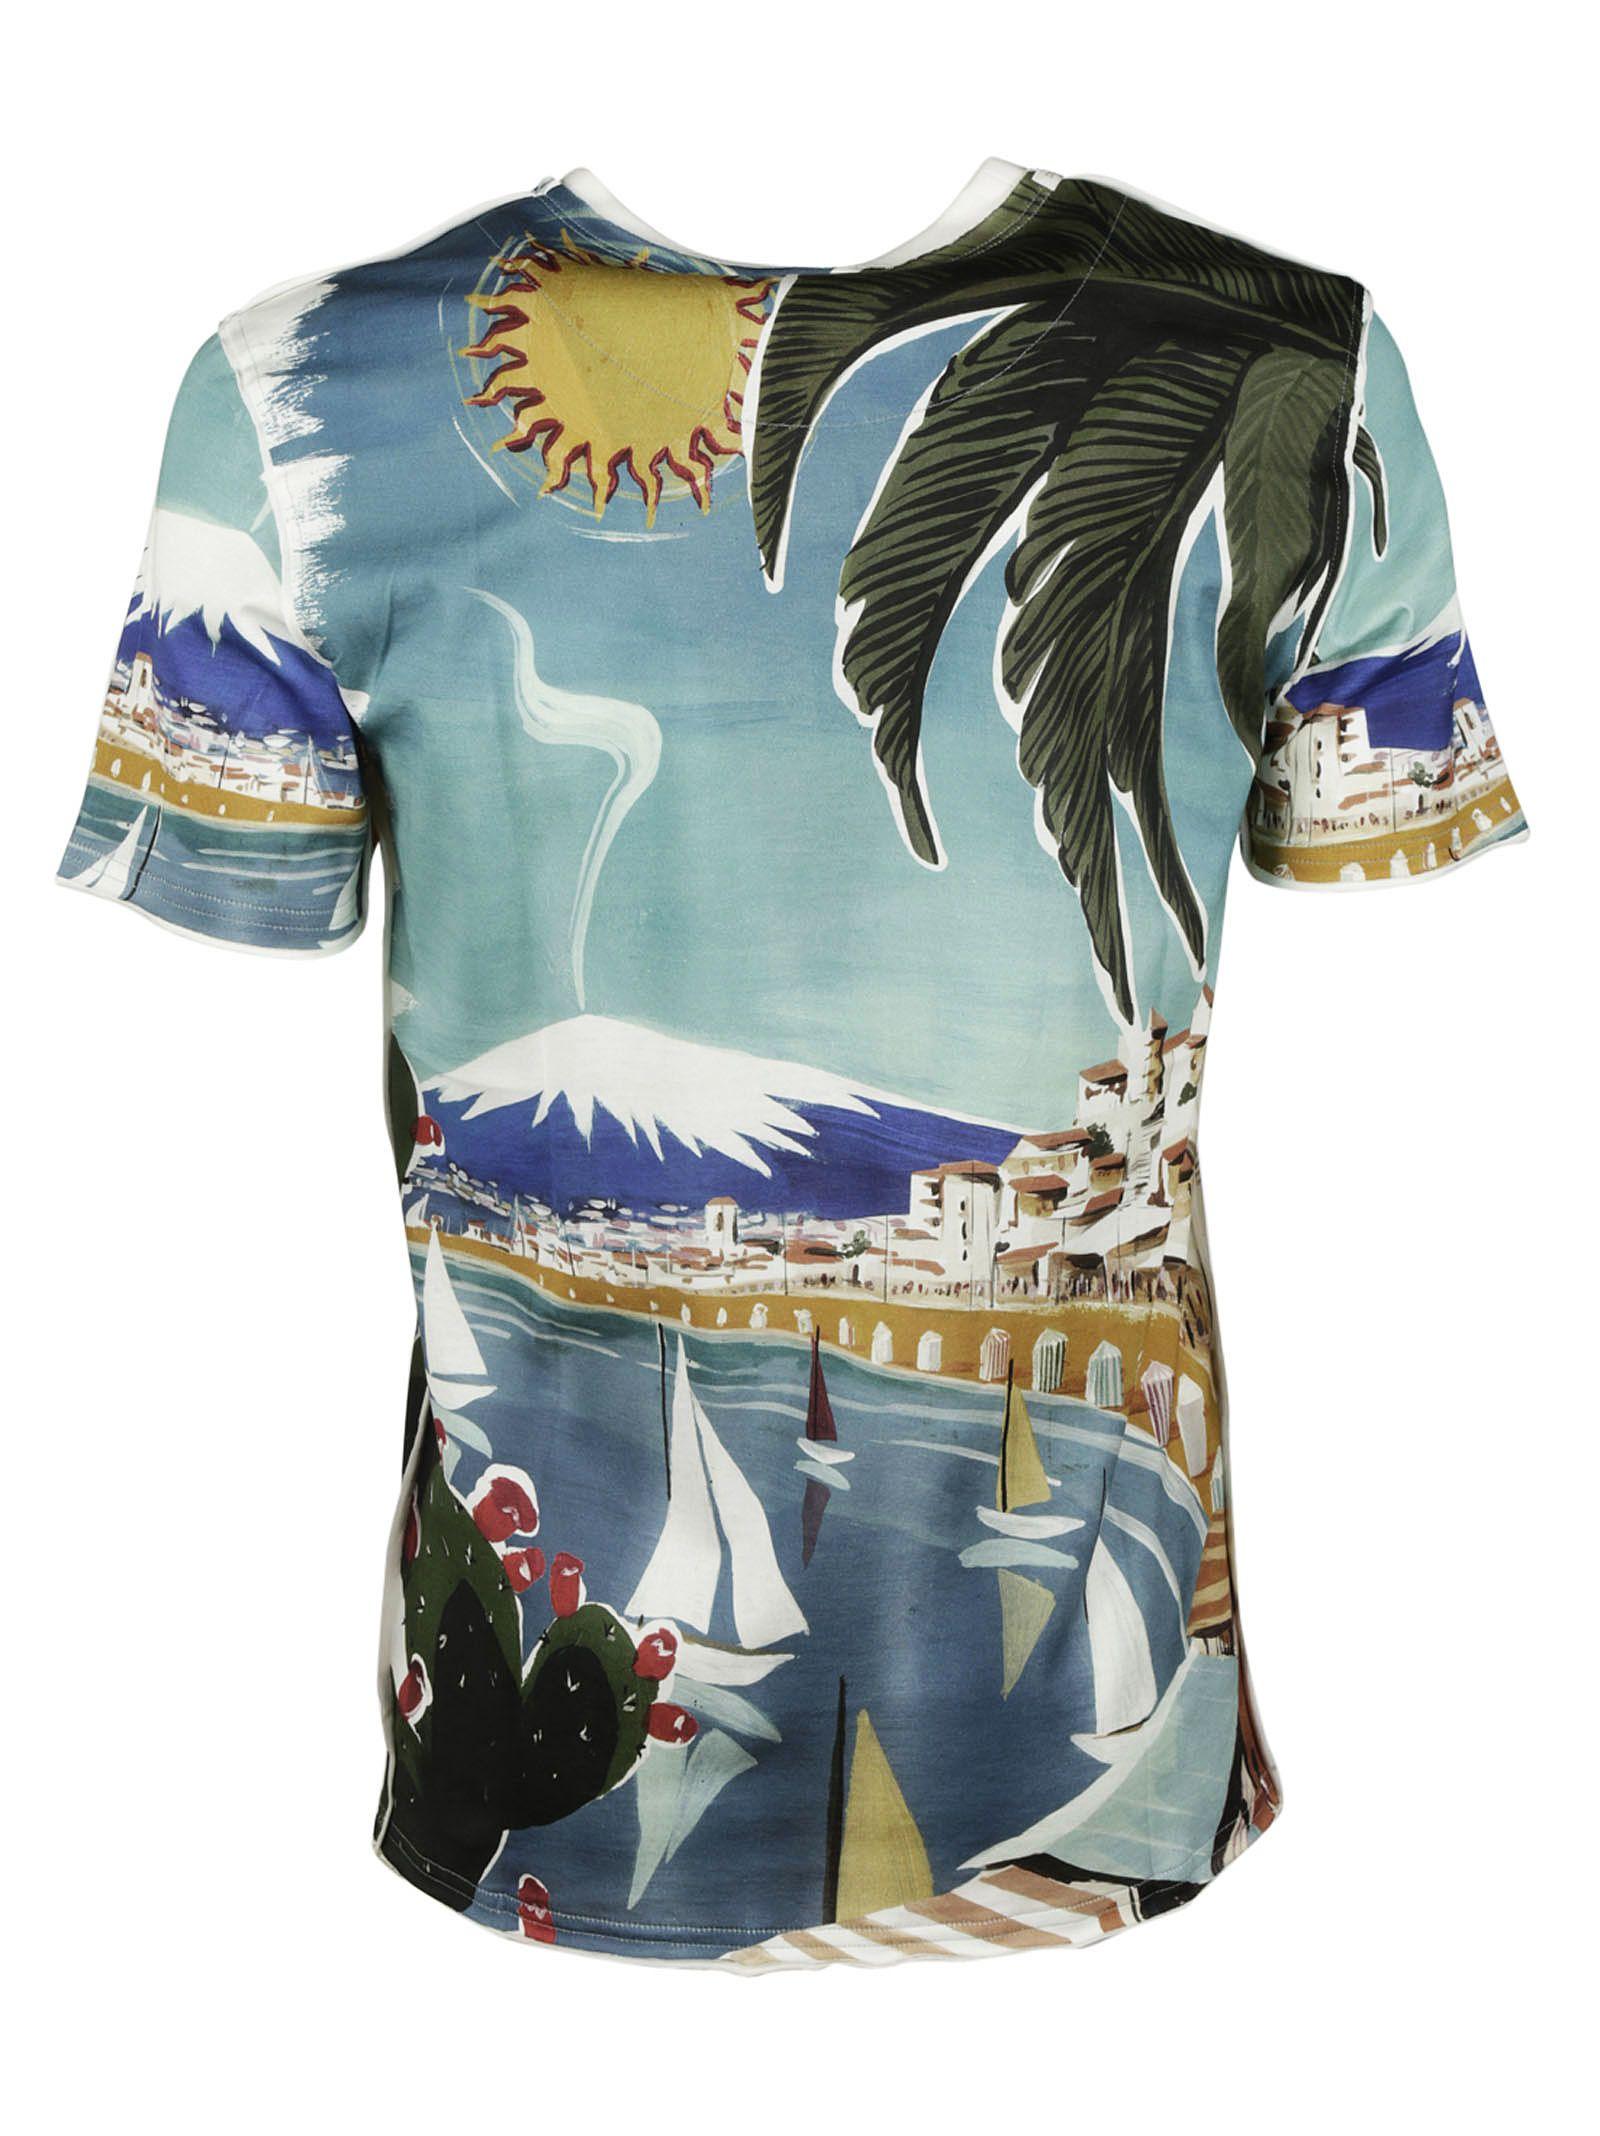 5af1332fb375f ... dolce gabbana dolce gabbana catania print t shirt multicolor ...